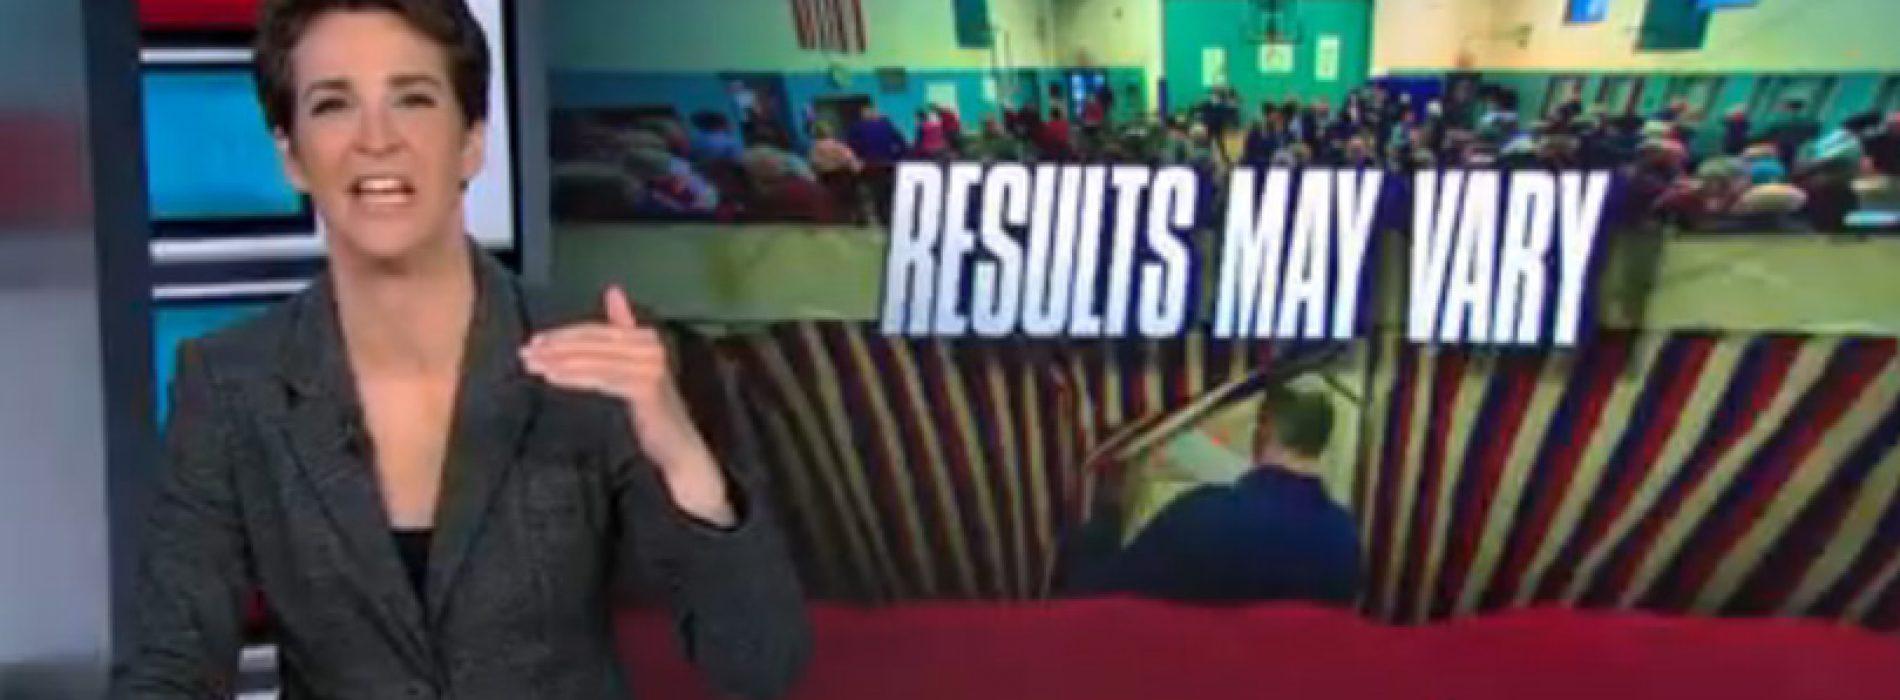 Rachel Maddow blasts Gov. LePage for veto denying life-saving drug